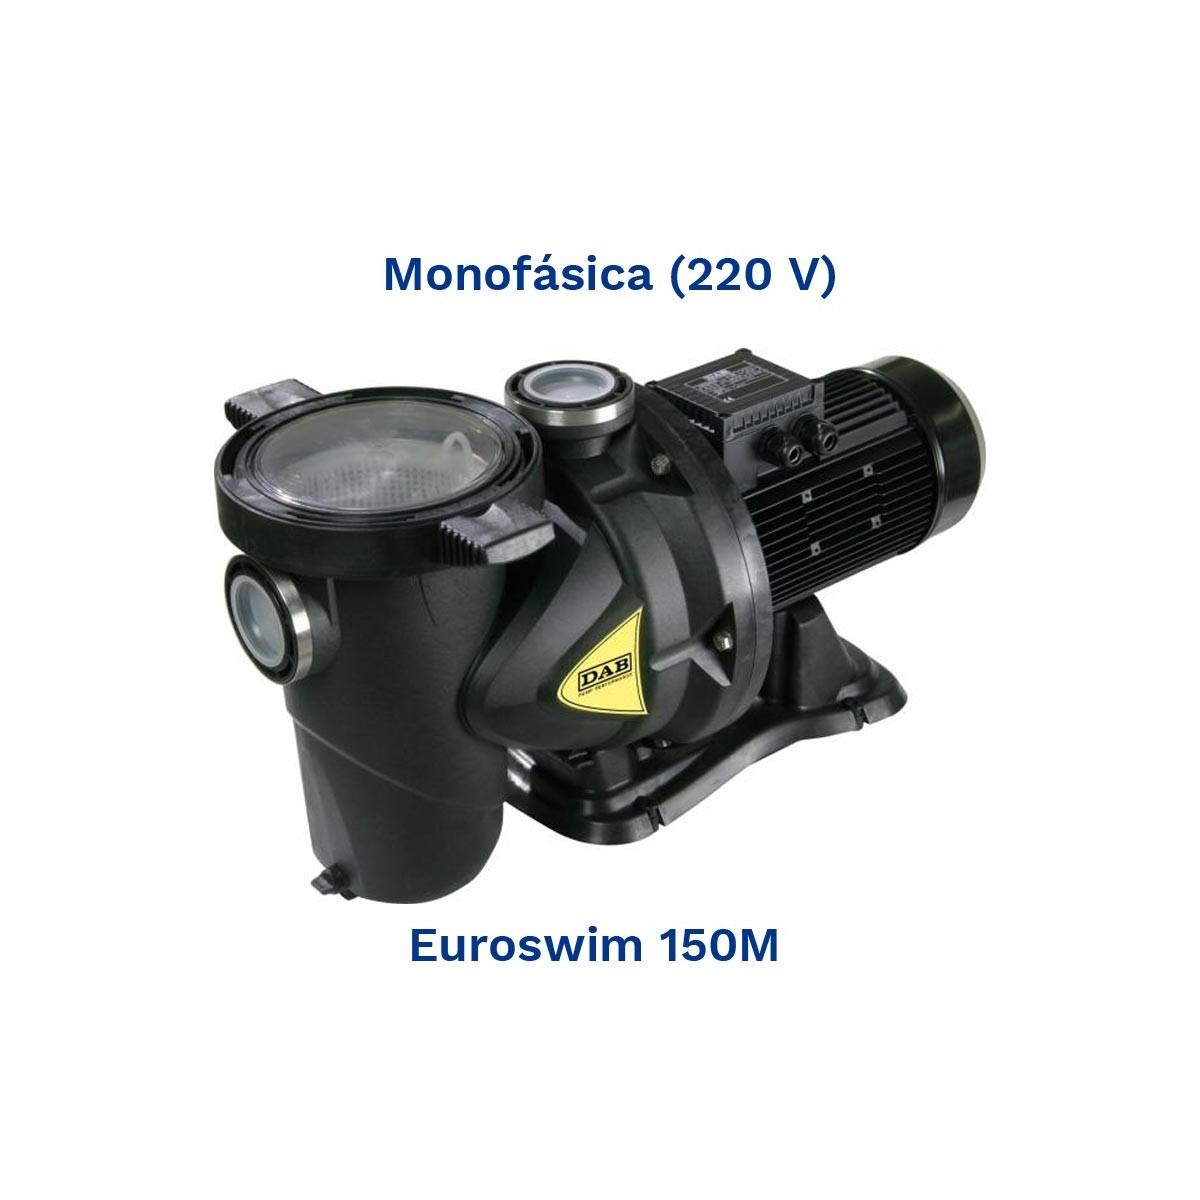 Dab bomba piscinas euroswim 150m (1